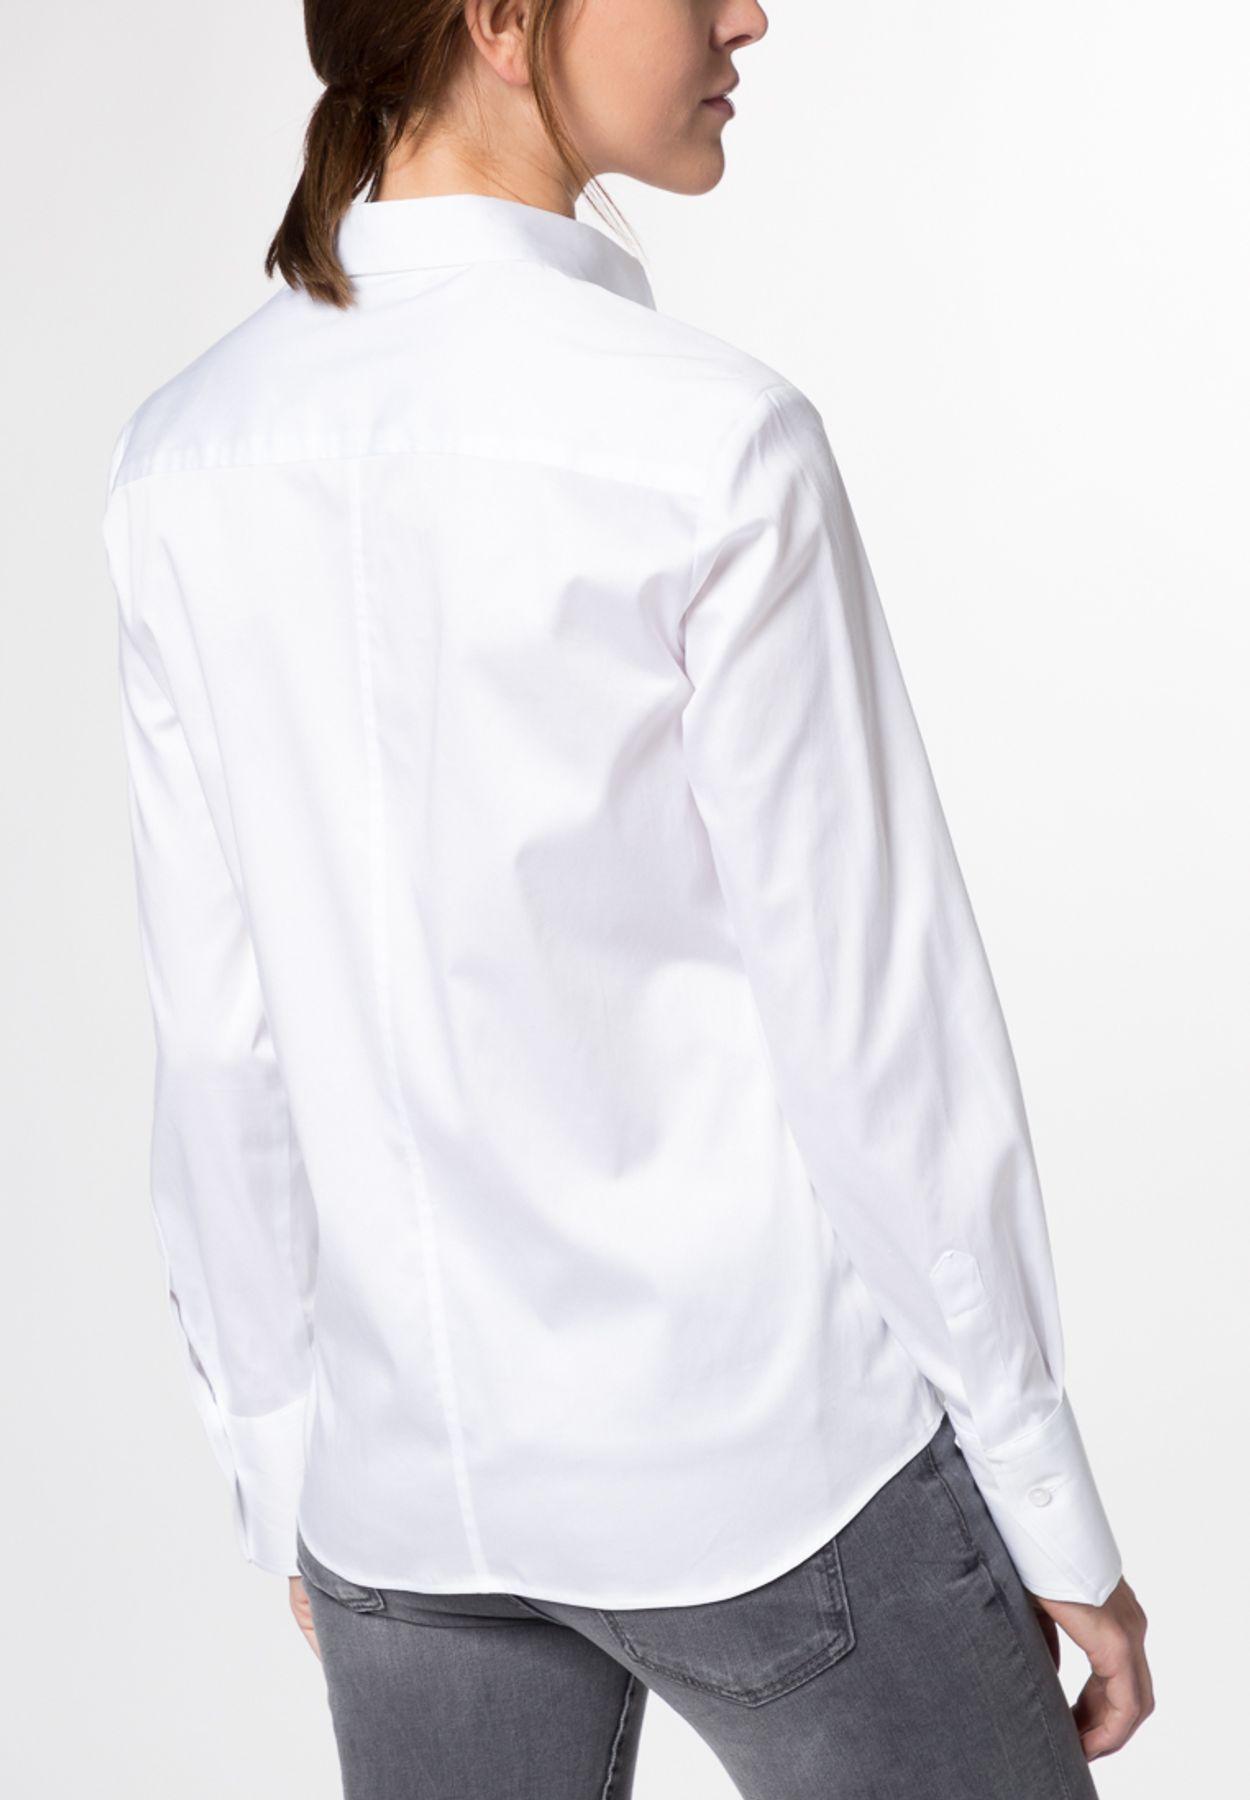 Eterna - Comfort Fit - Damen Langarm Bluse Modern Classic Stretch in versch. Farben (5352 D708) – Bild 3